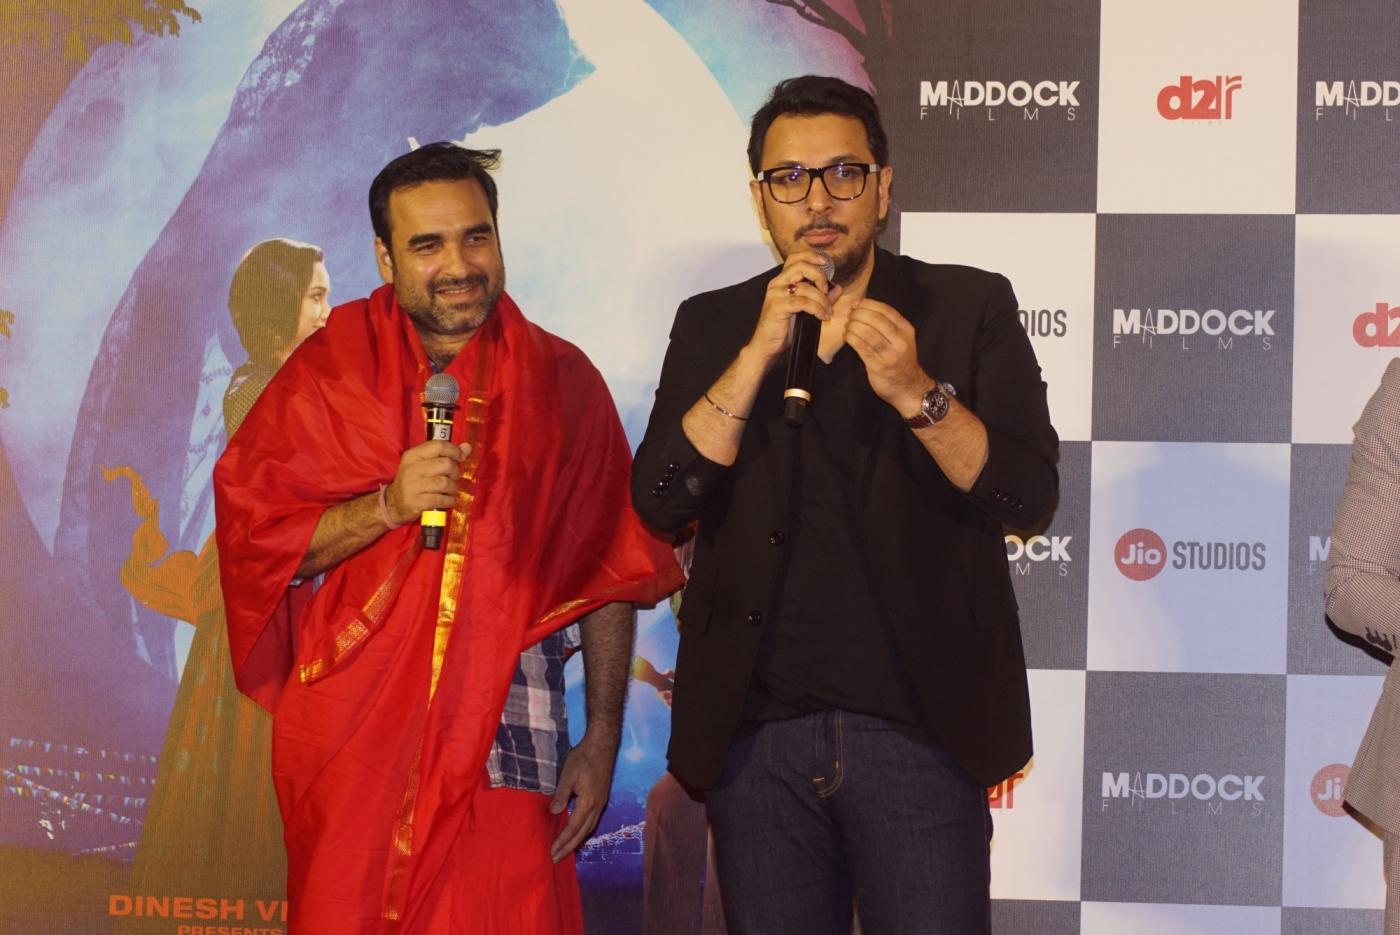 Mumbai: Actors Pankaj Tripathi and producer Dinesh Vijan at the trailer launch of their upcoming film